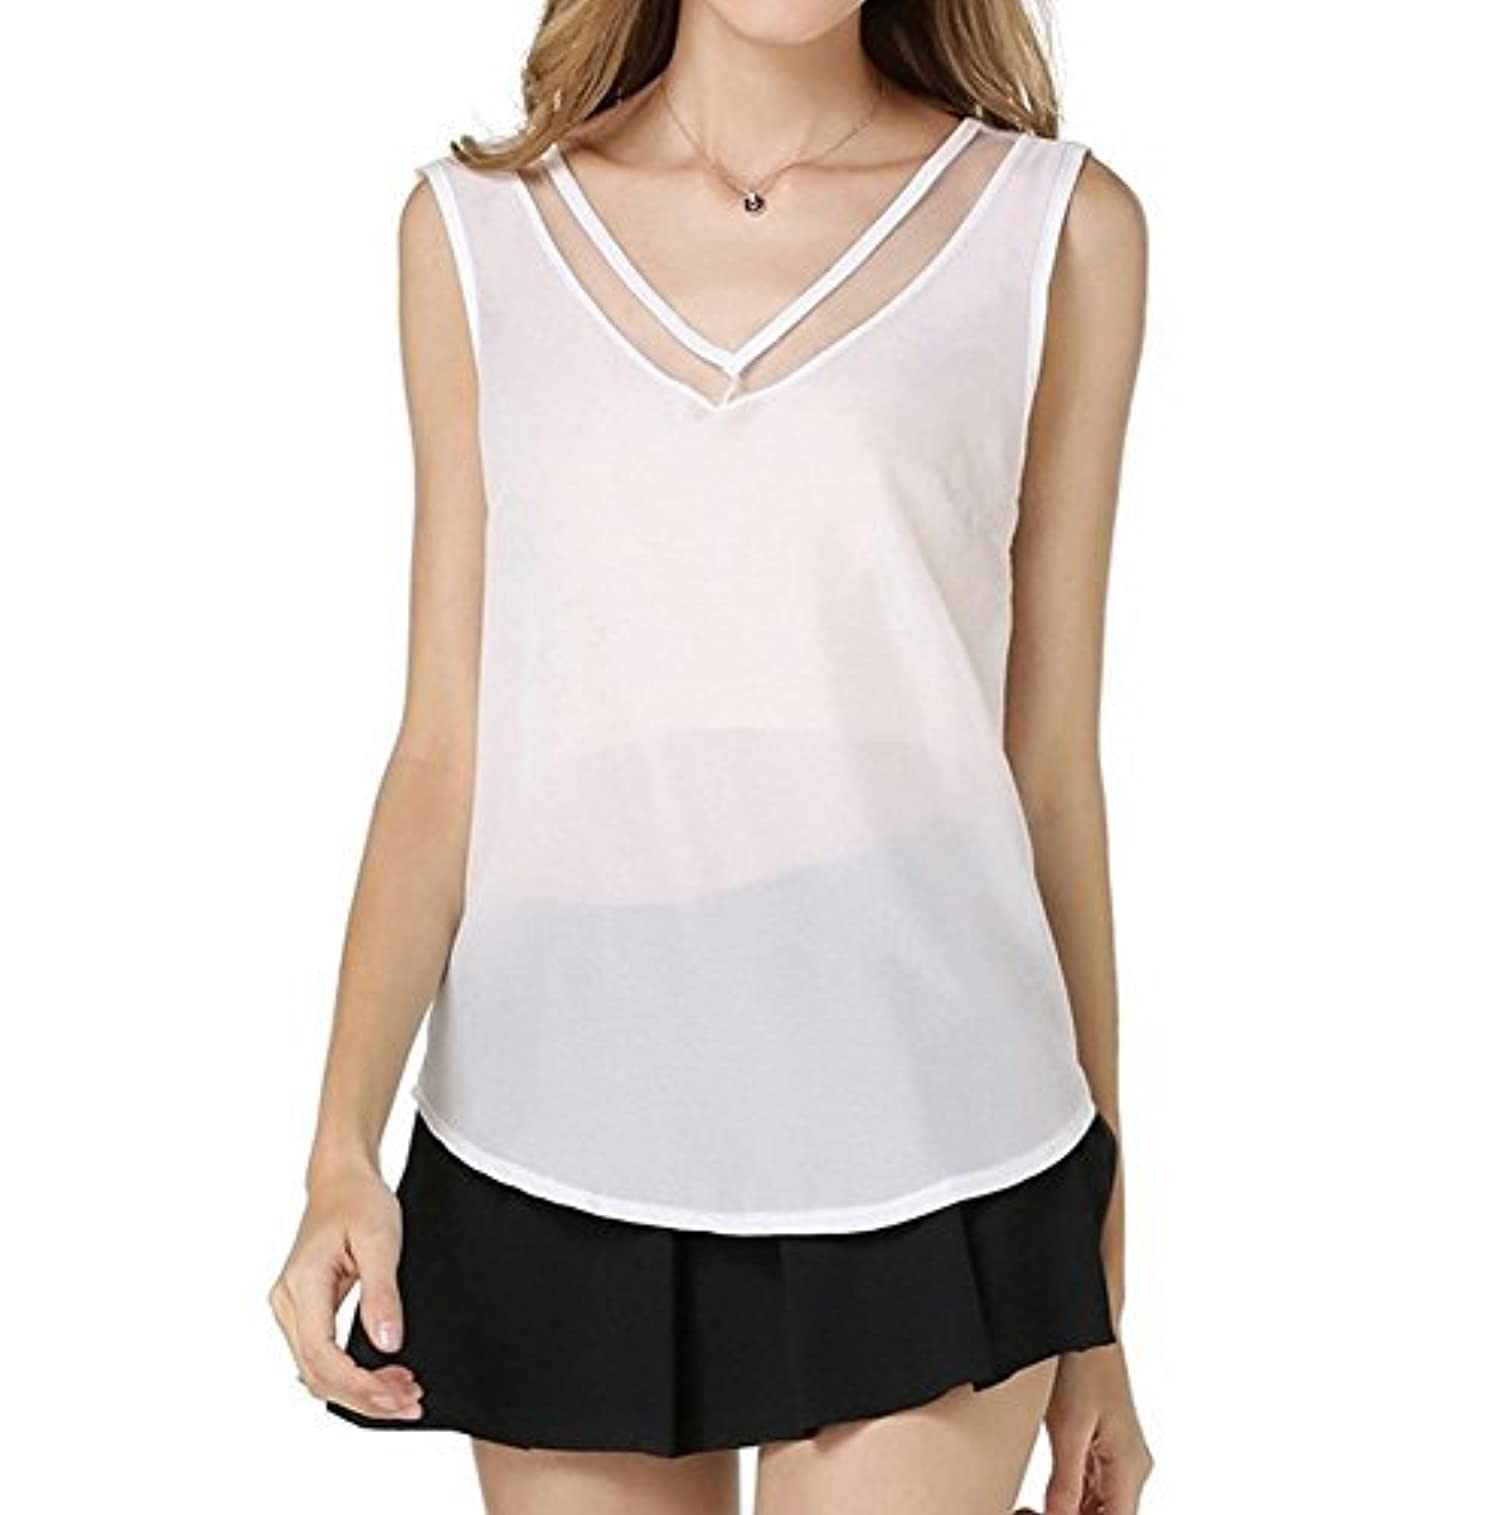 Calyfer Womens Chiffon Sleeveless V Neck Solid Shirt Blouse Tops White Small